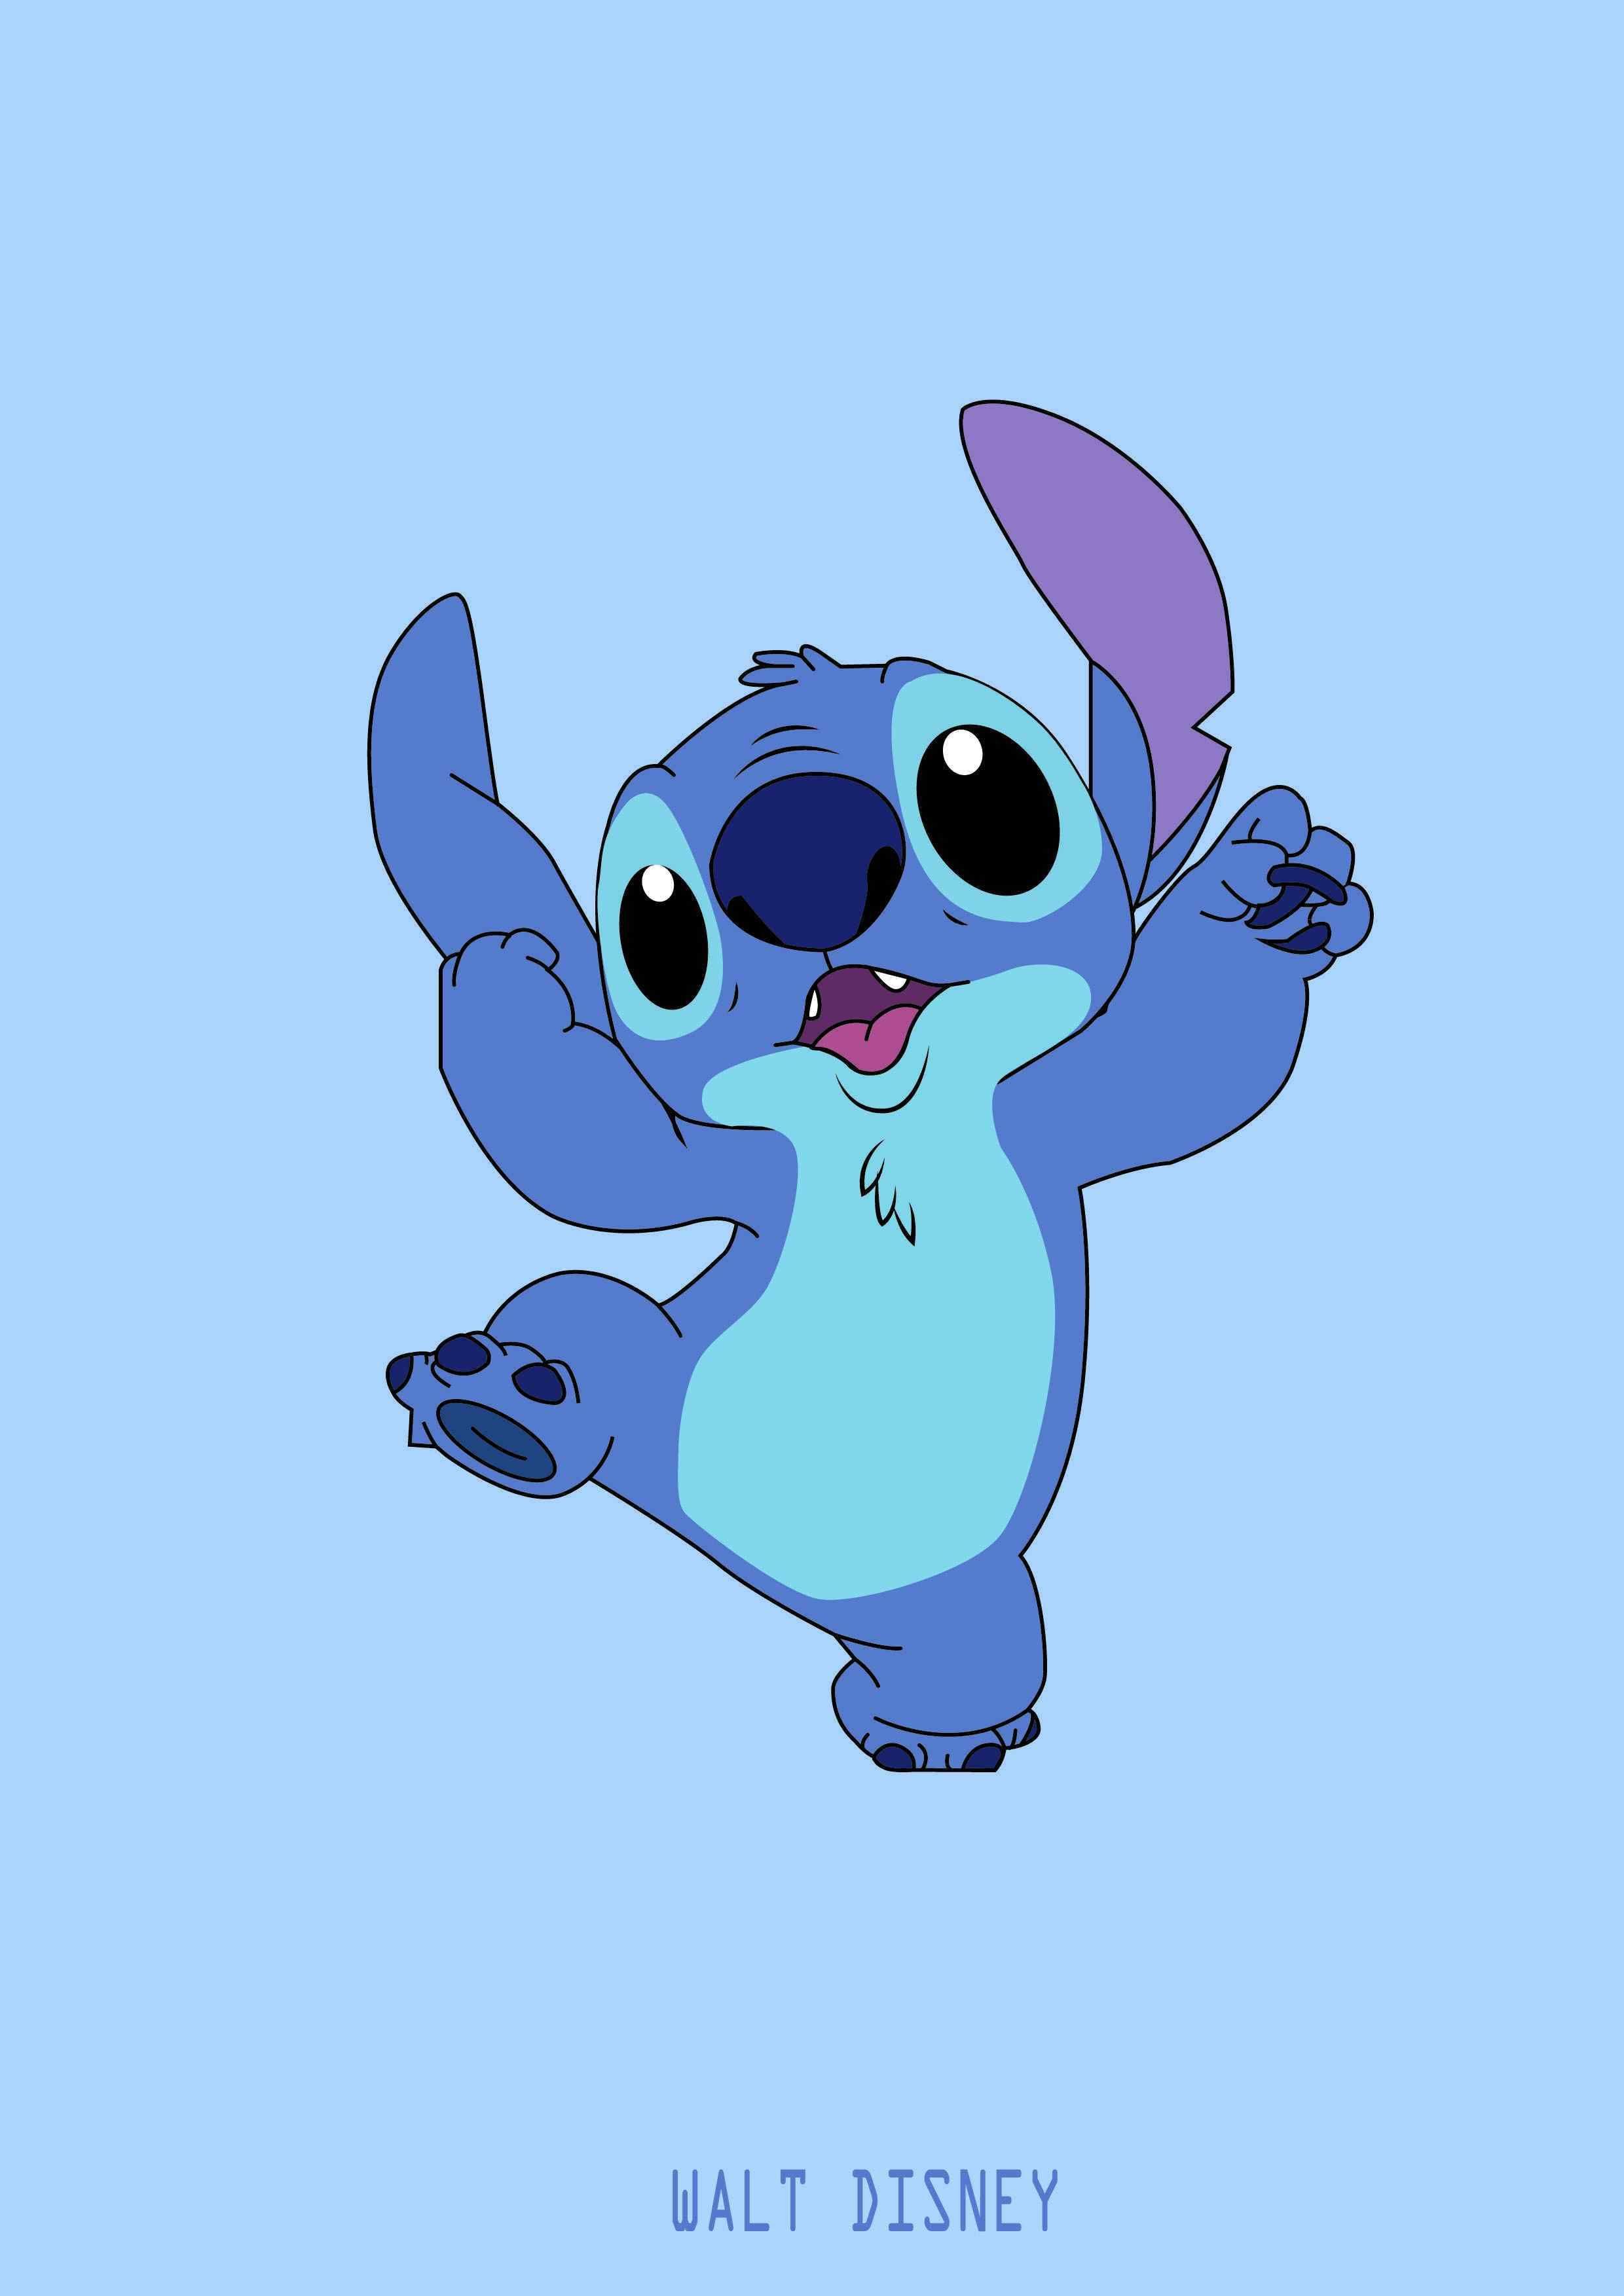 Fond Decran Kawaii Disney Stitch 2020 Cliquez ici